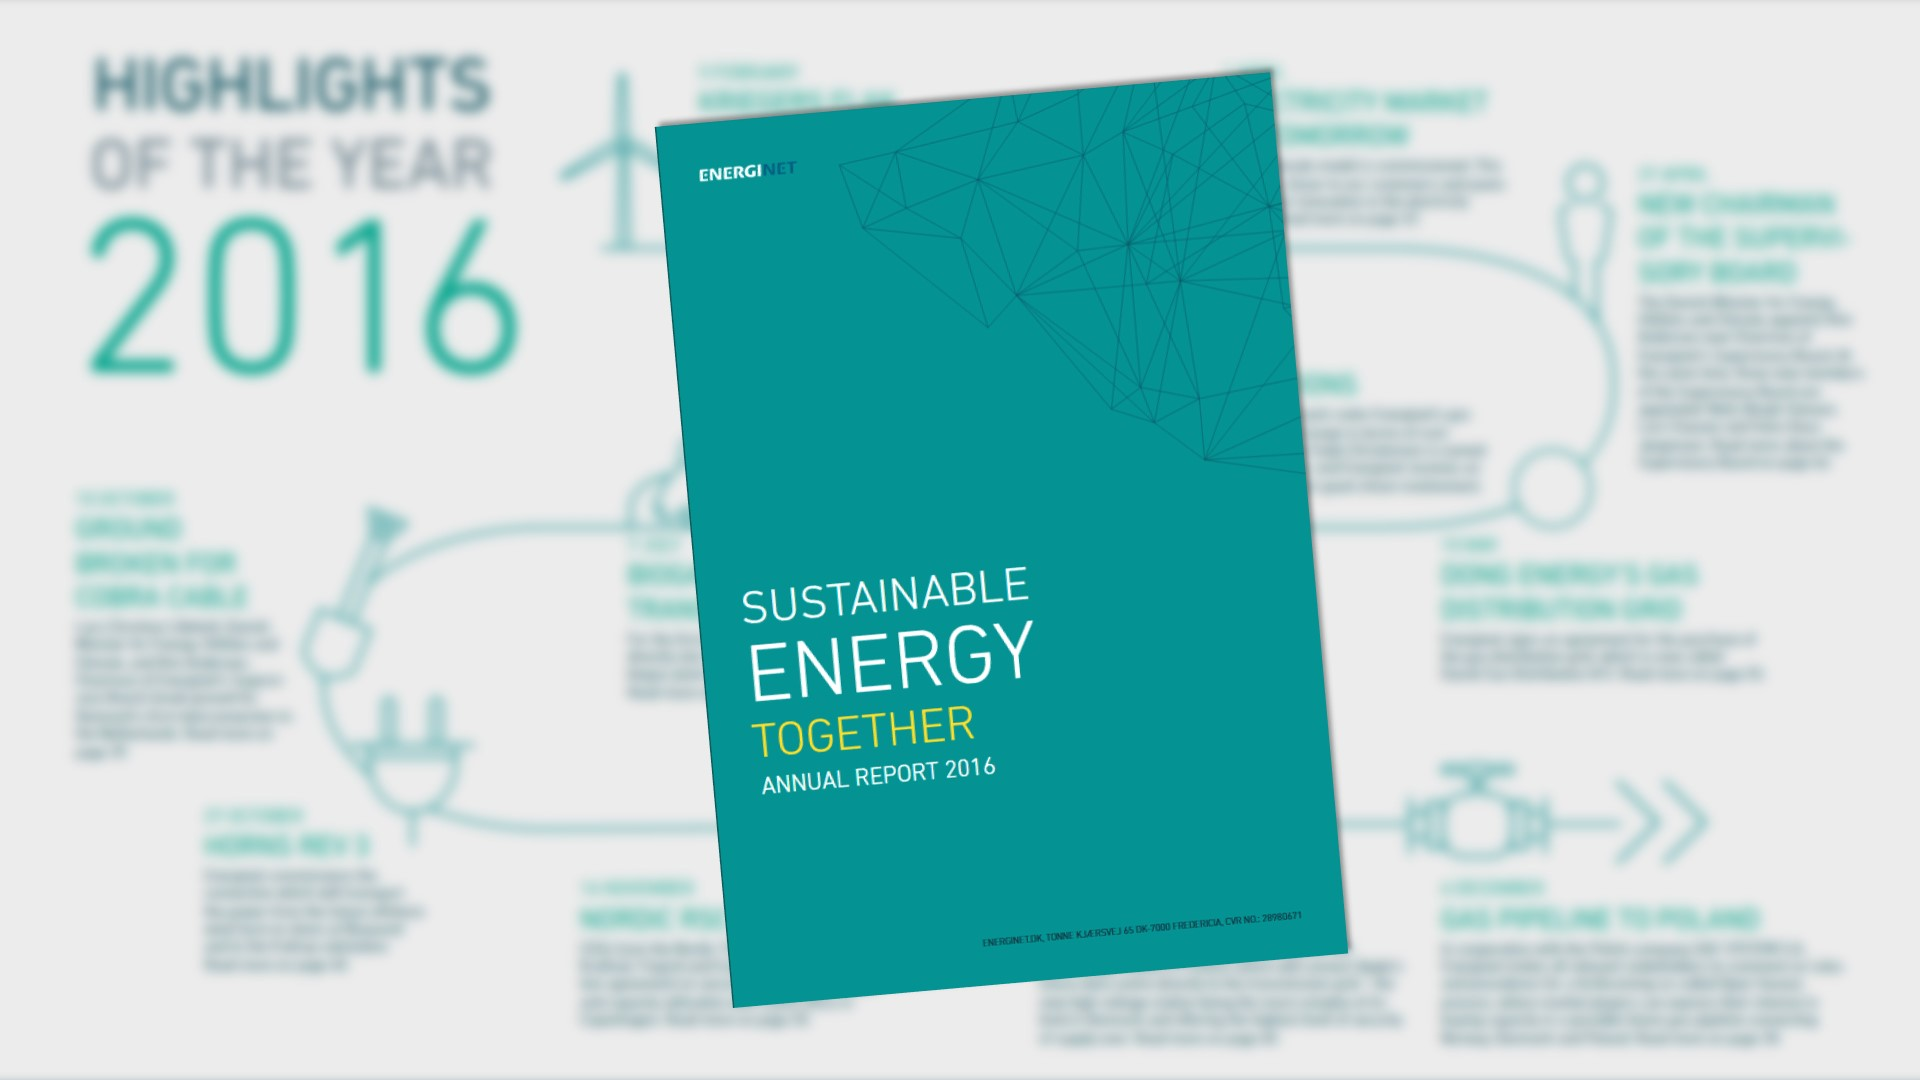 Danes heading towards a sustainable future